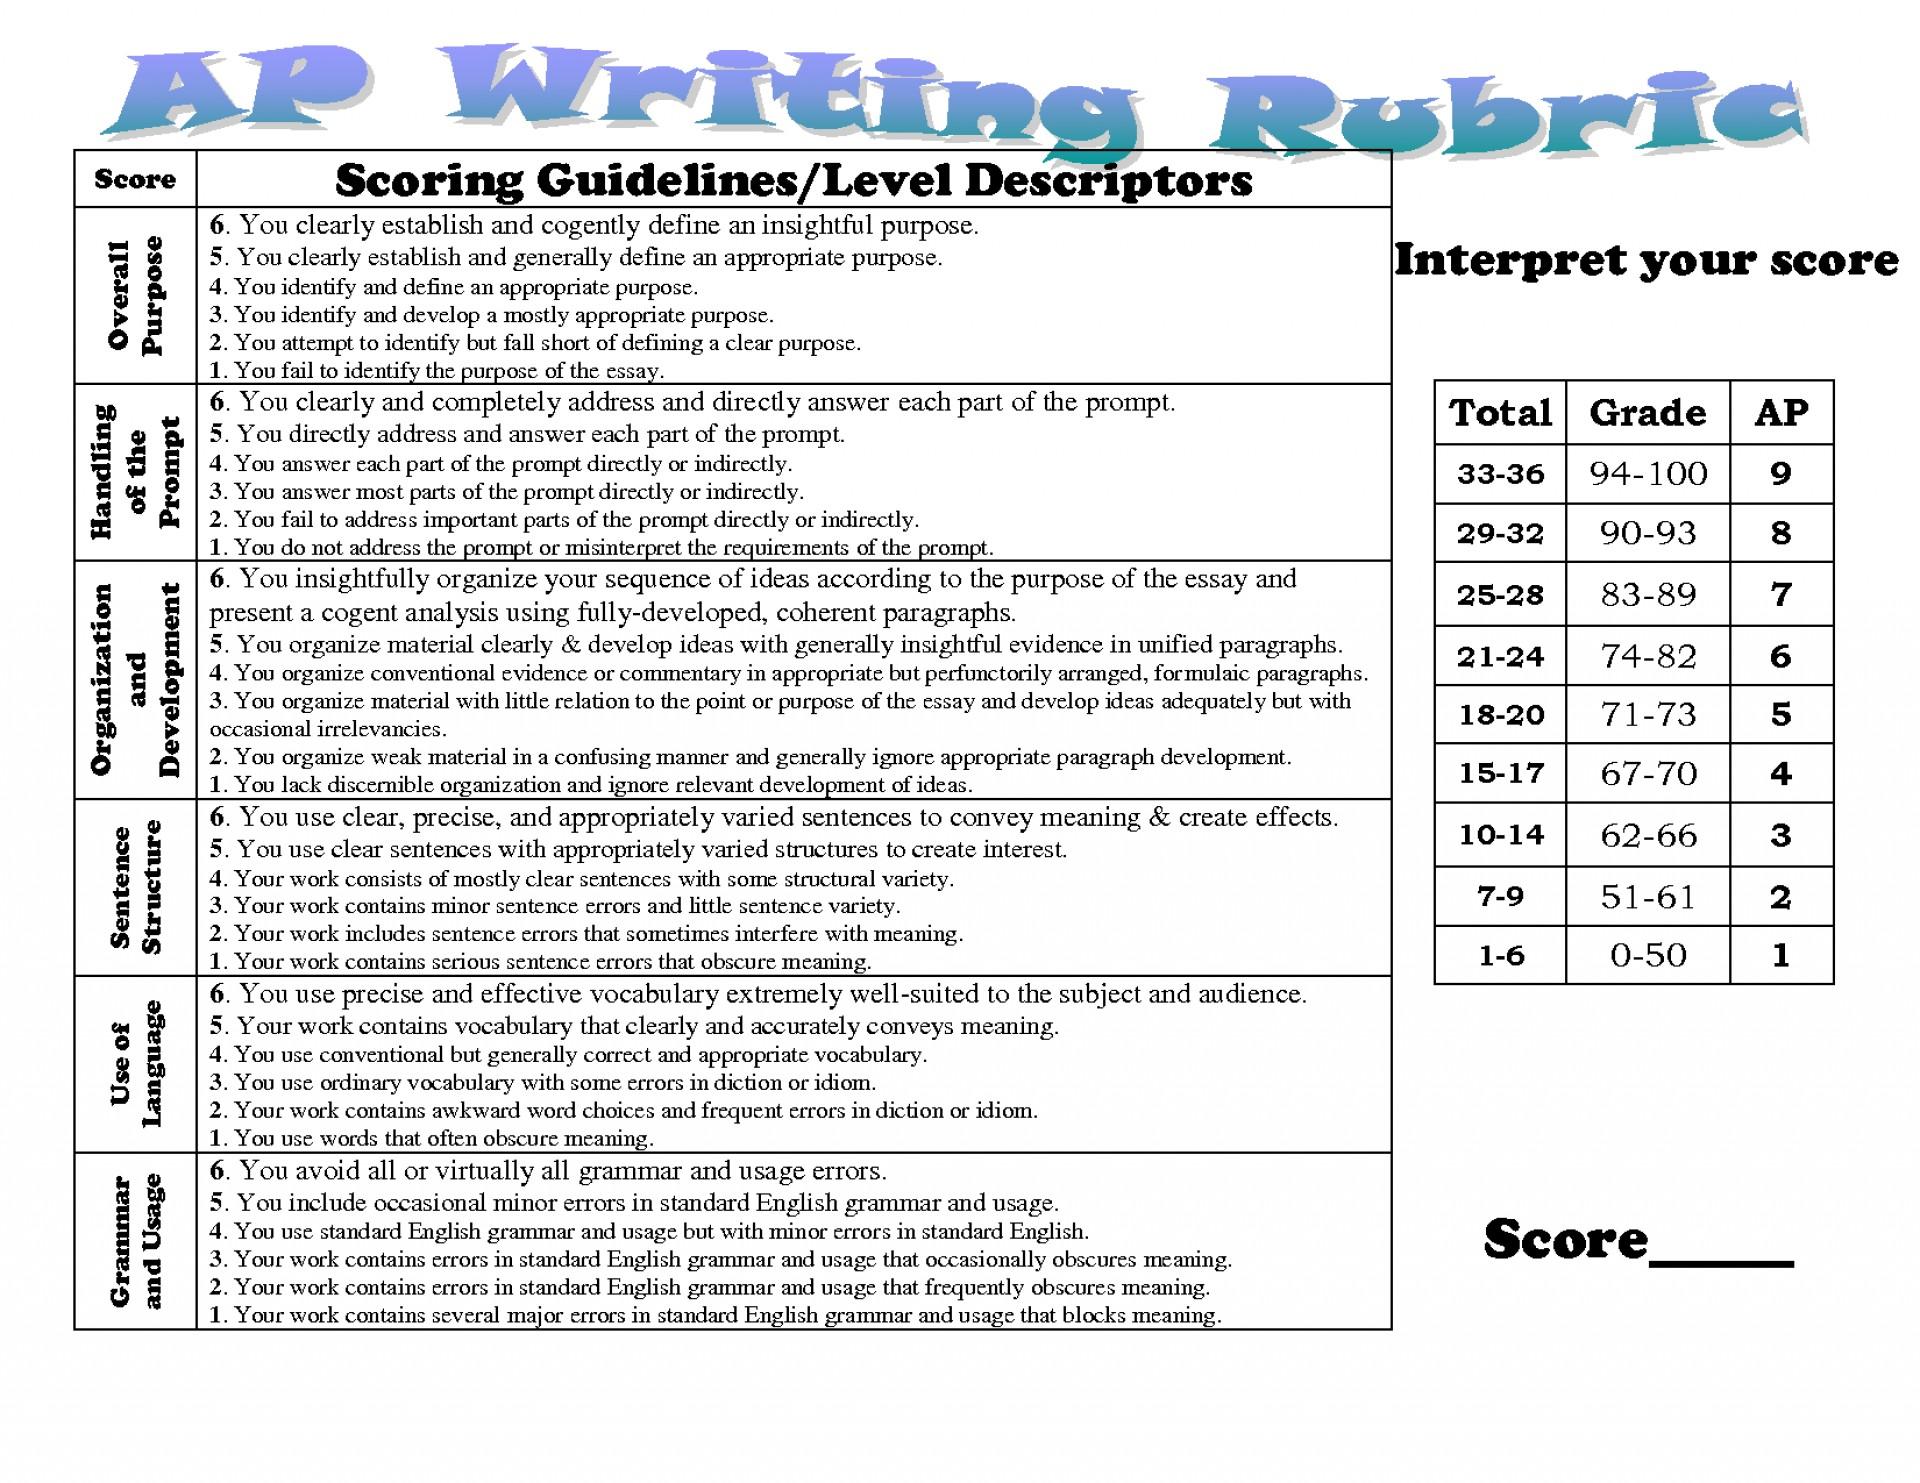 006 Free Online Essay Grader Ap English Language Composition Argument Rubric Coursework Help Tips Thesis Prompts Outlines Review Sensational For Teachers Paper Students 1920